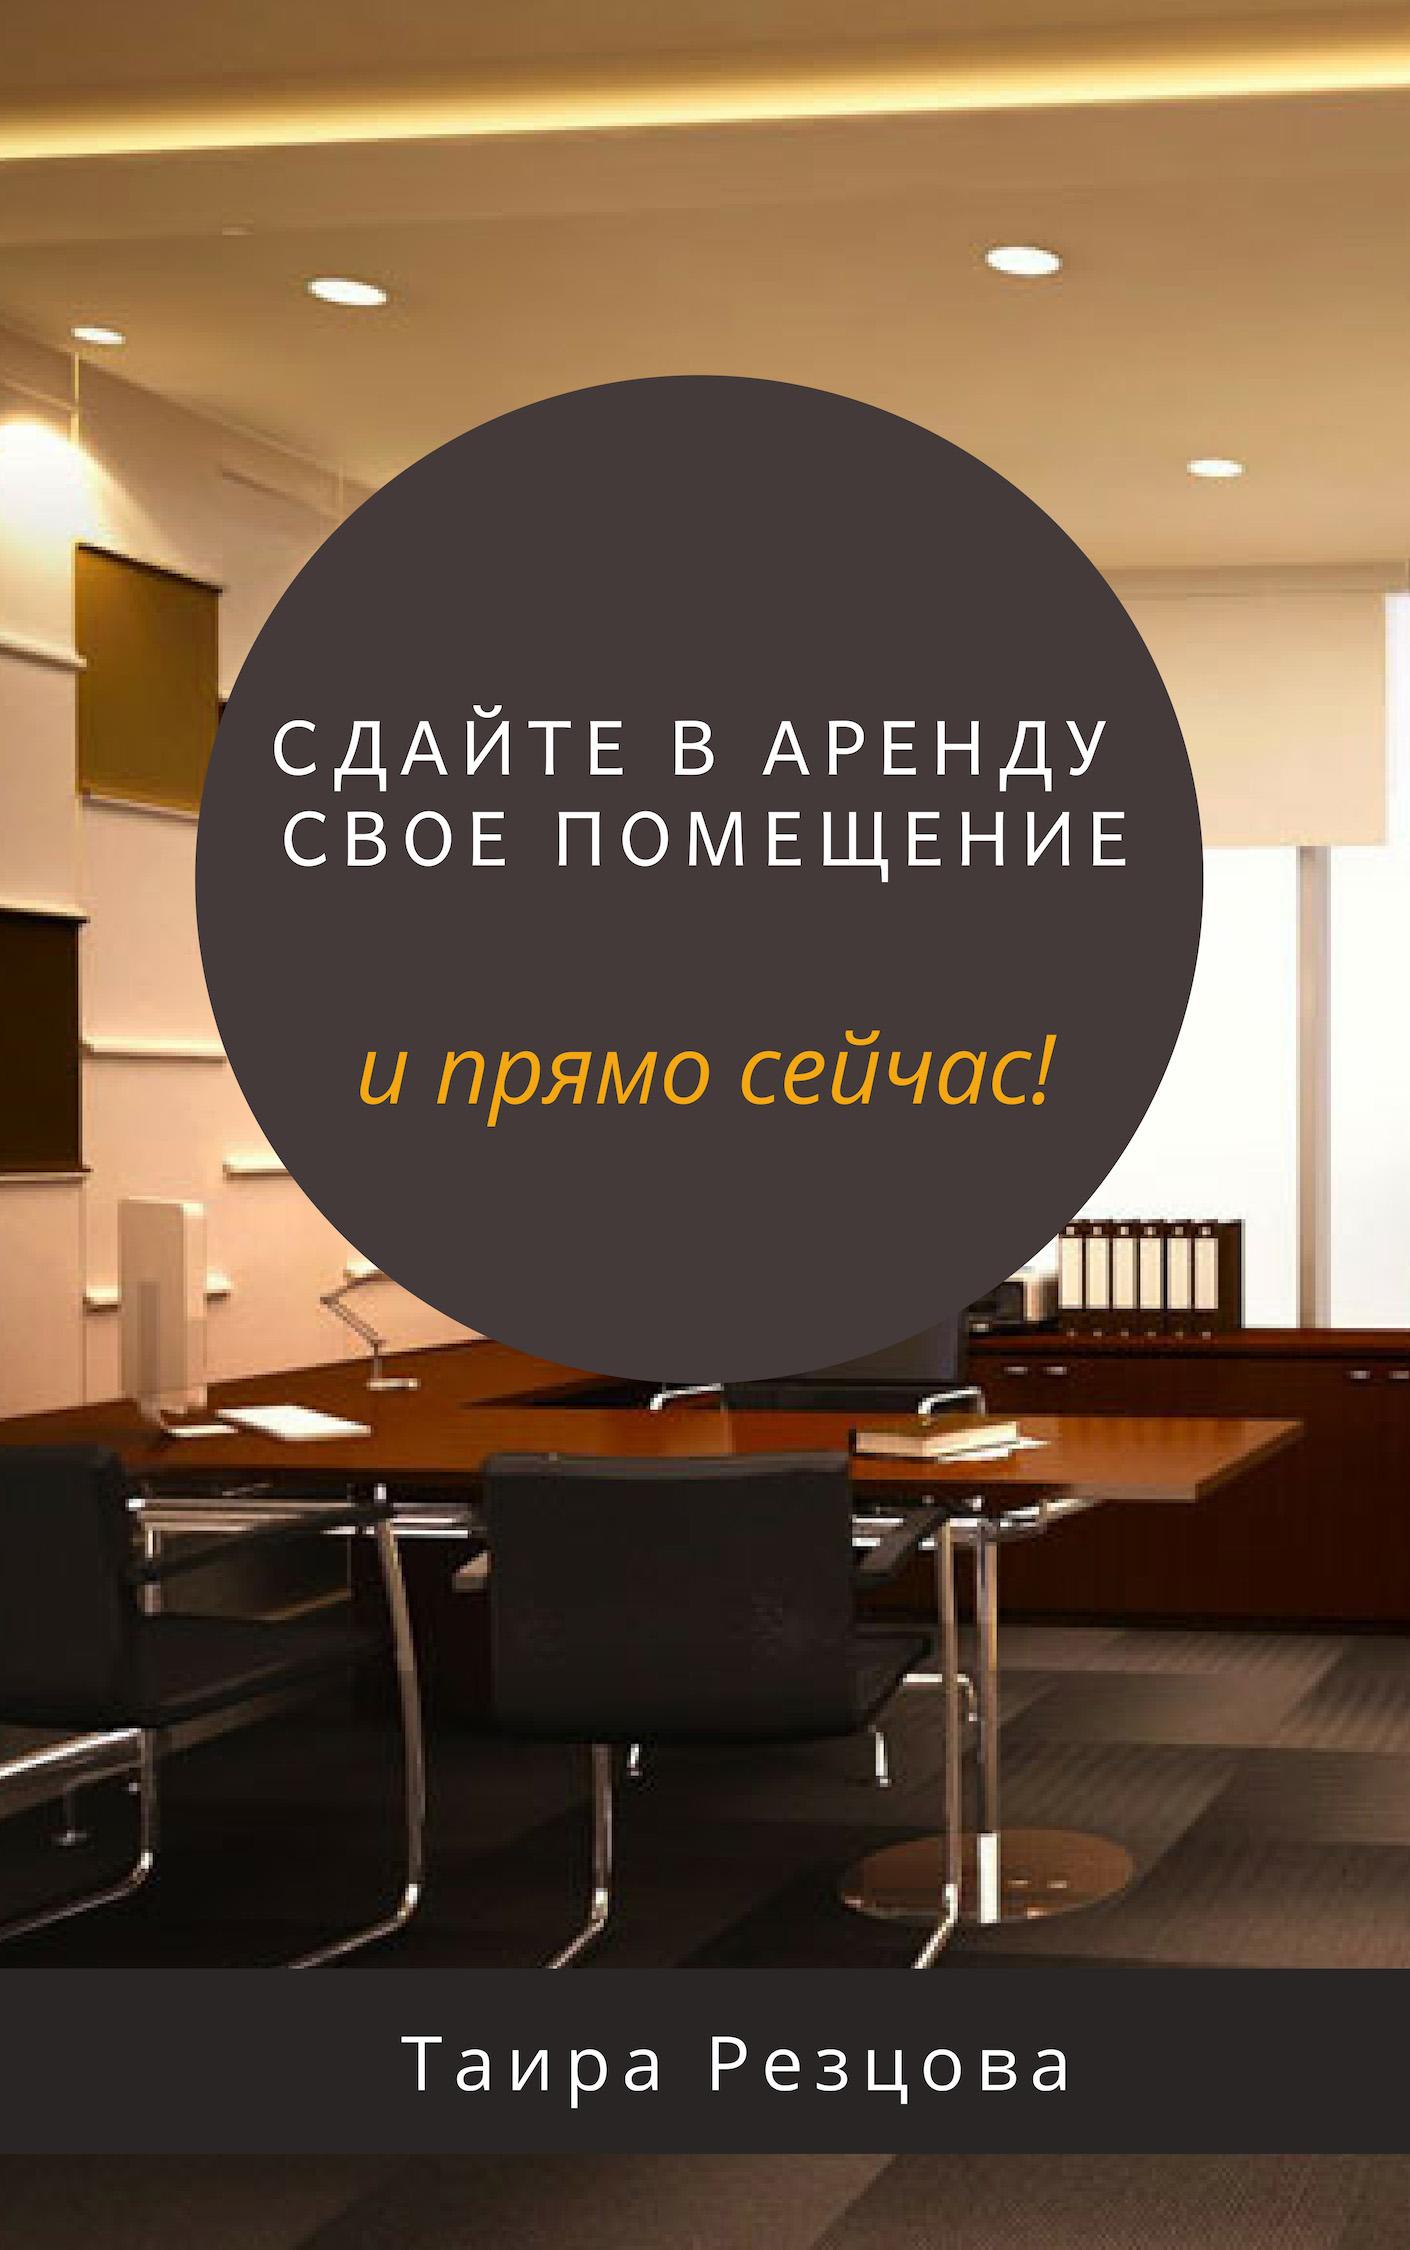 Обложка книги. Автор - Таира Резцова